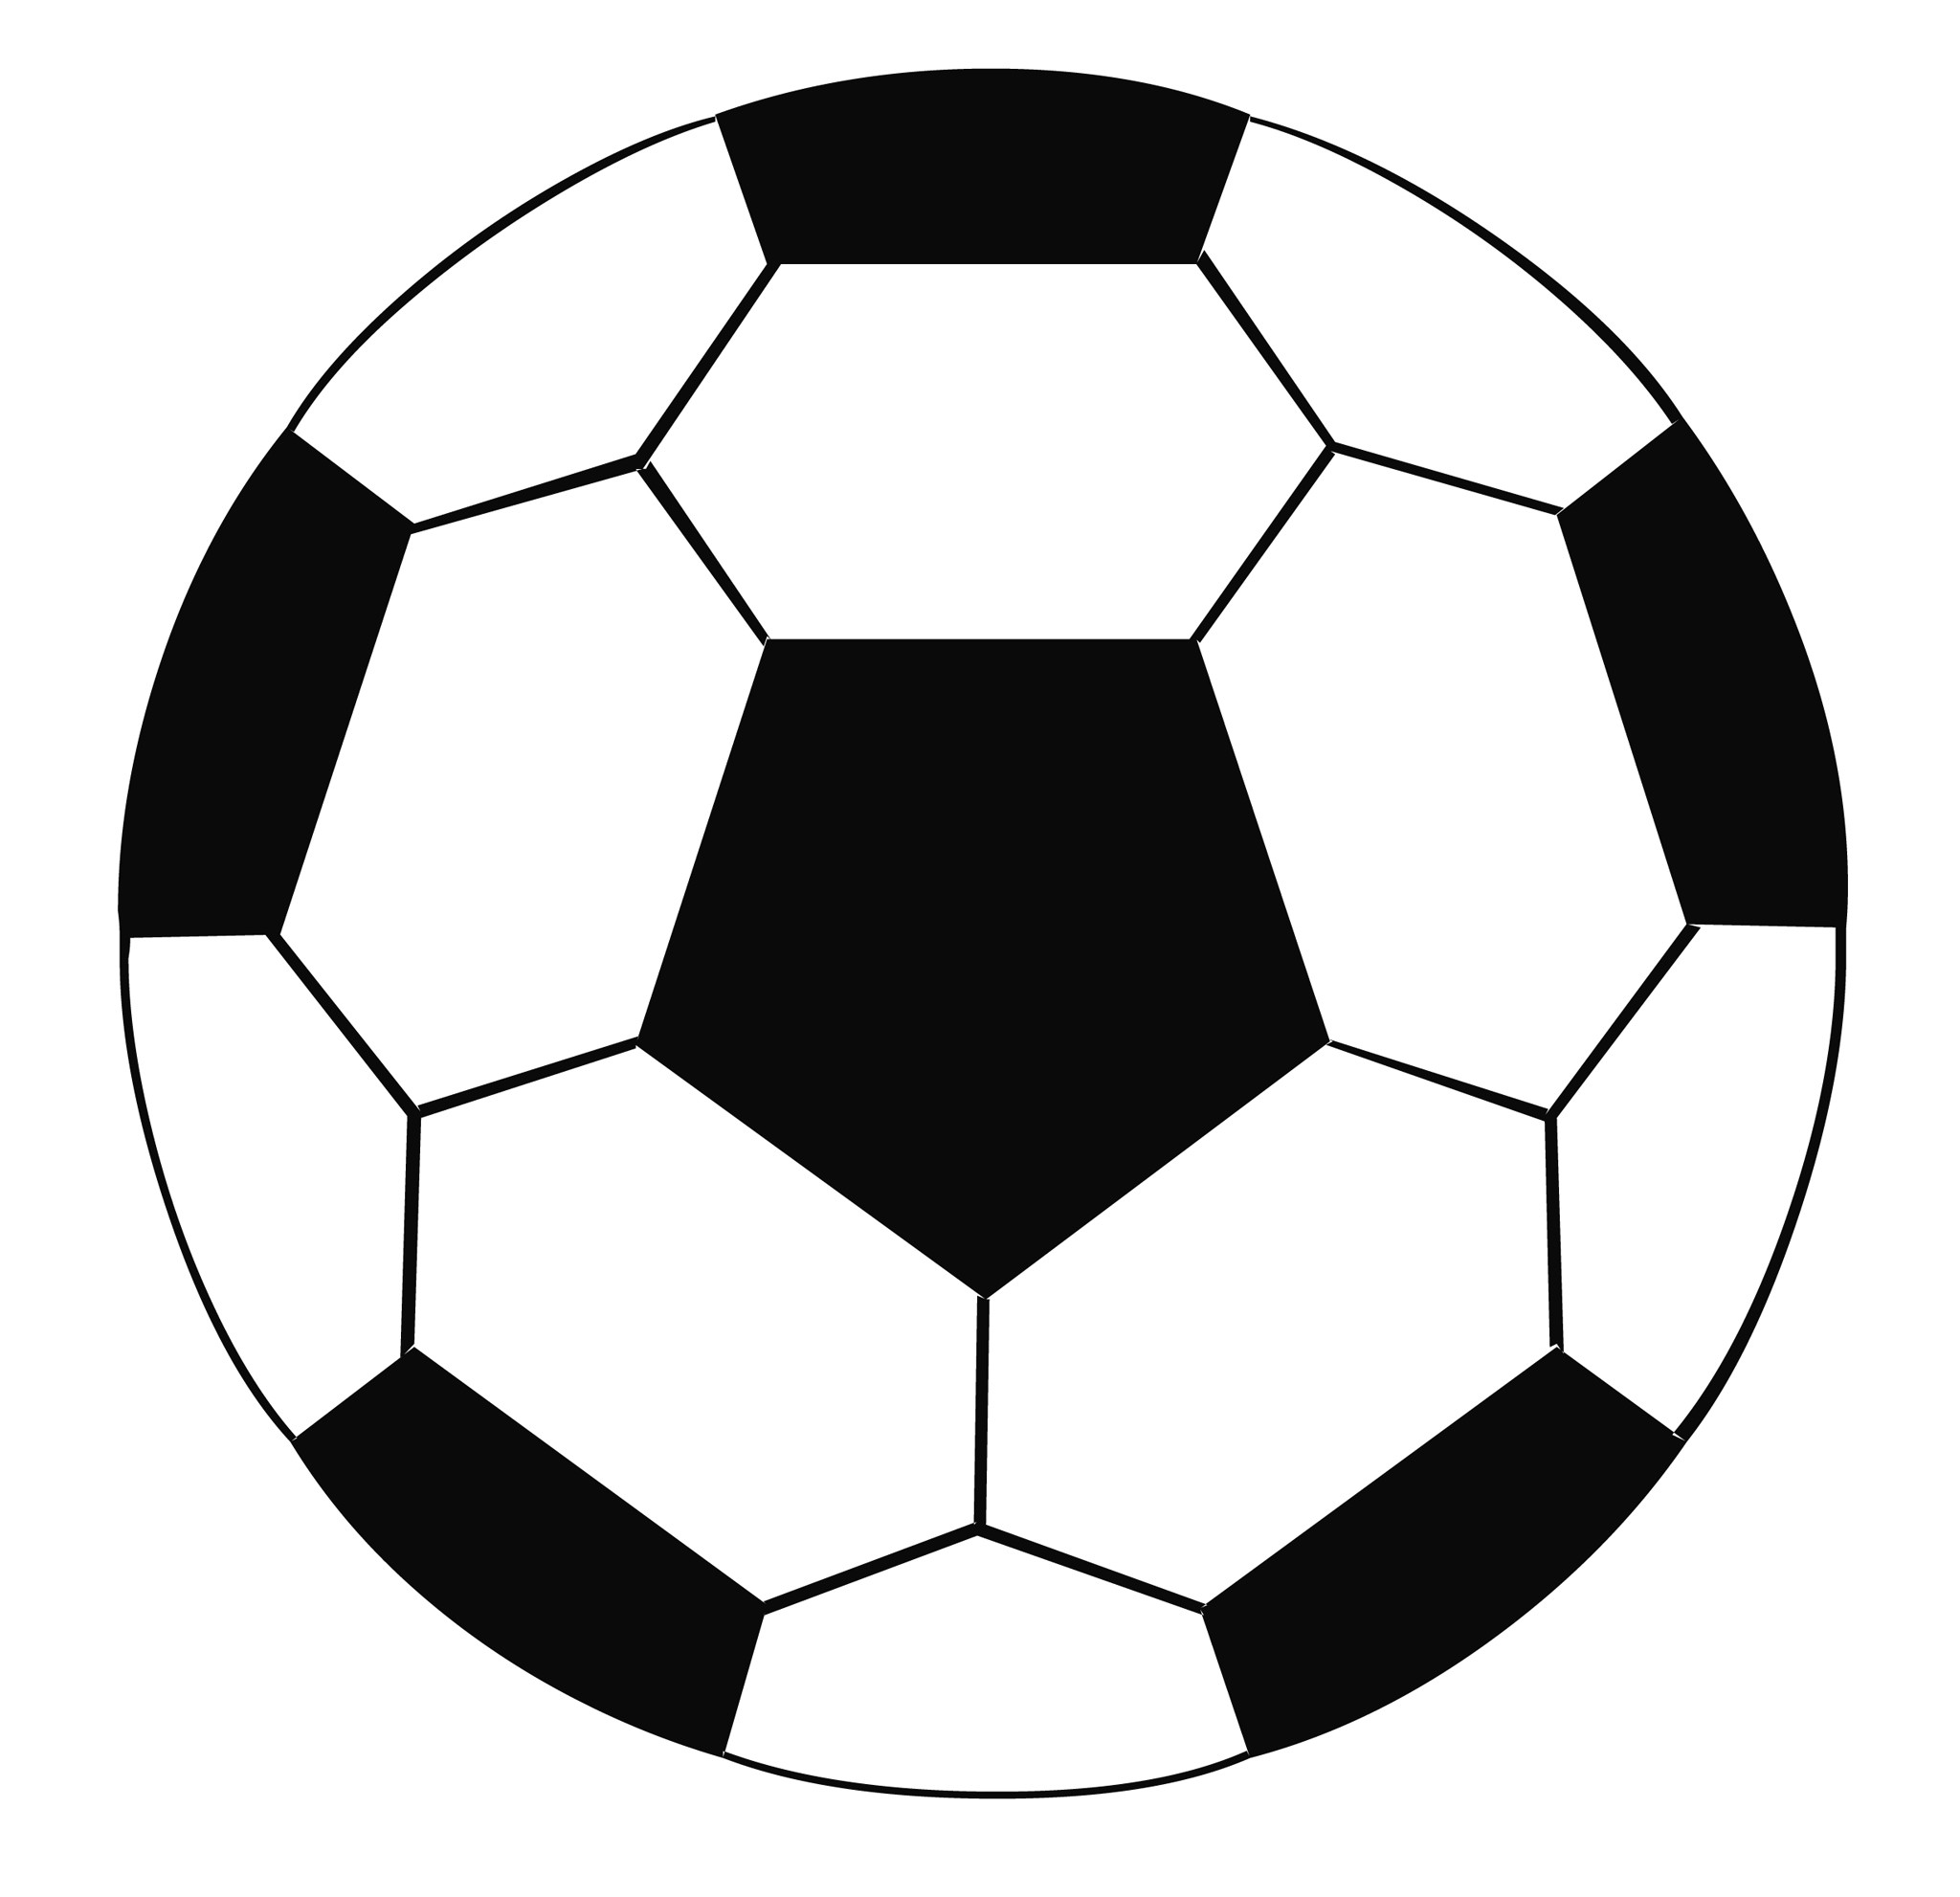 ... clip art soccer ball; Fre - Soccerball Clip Art